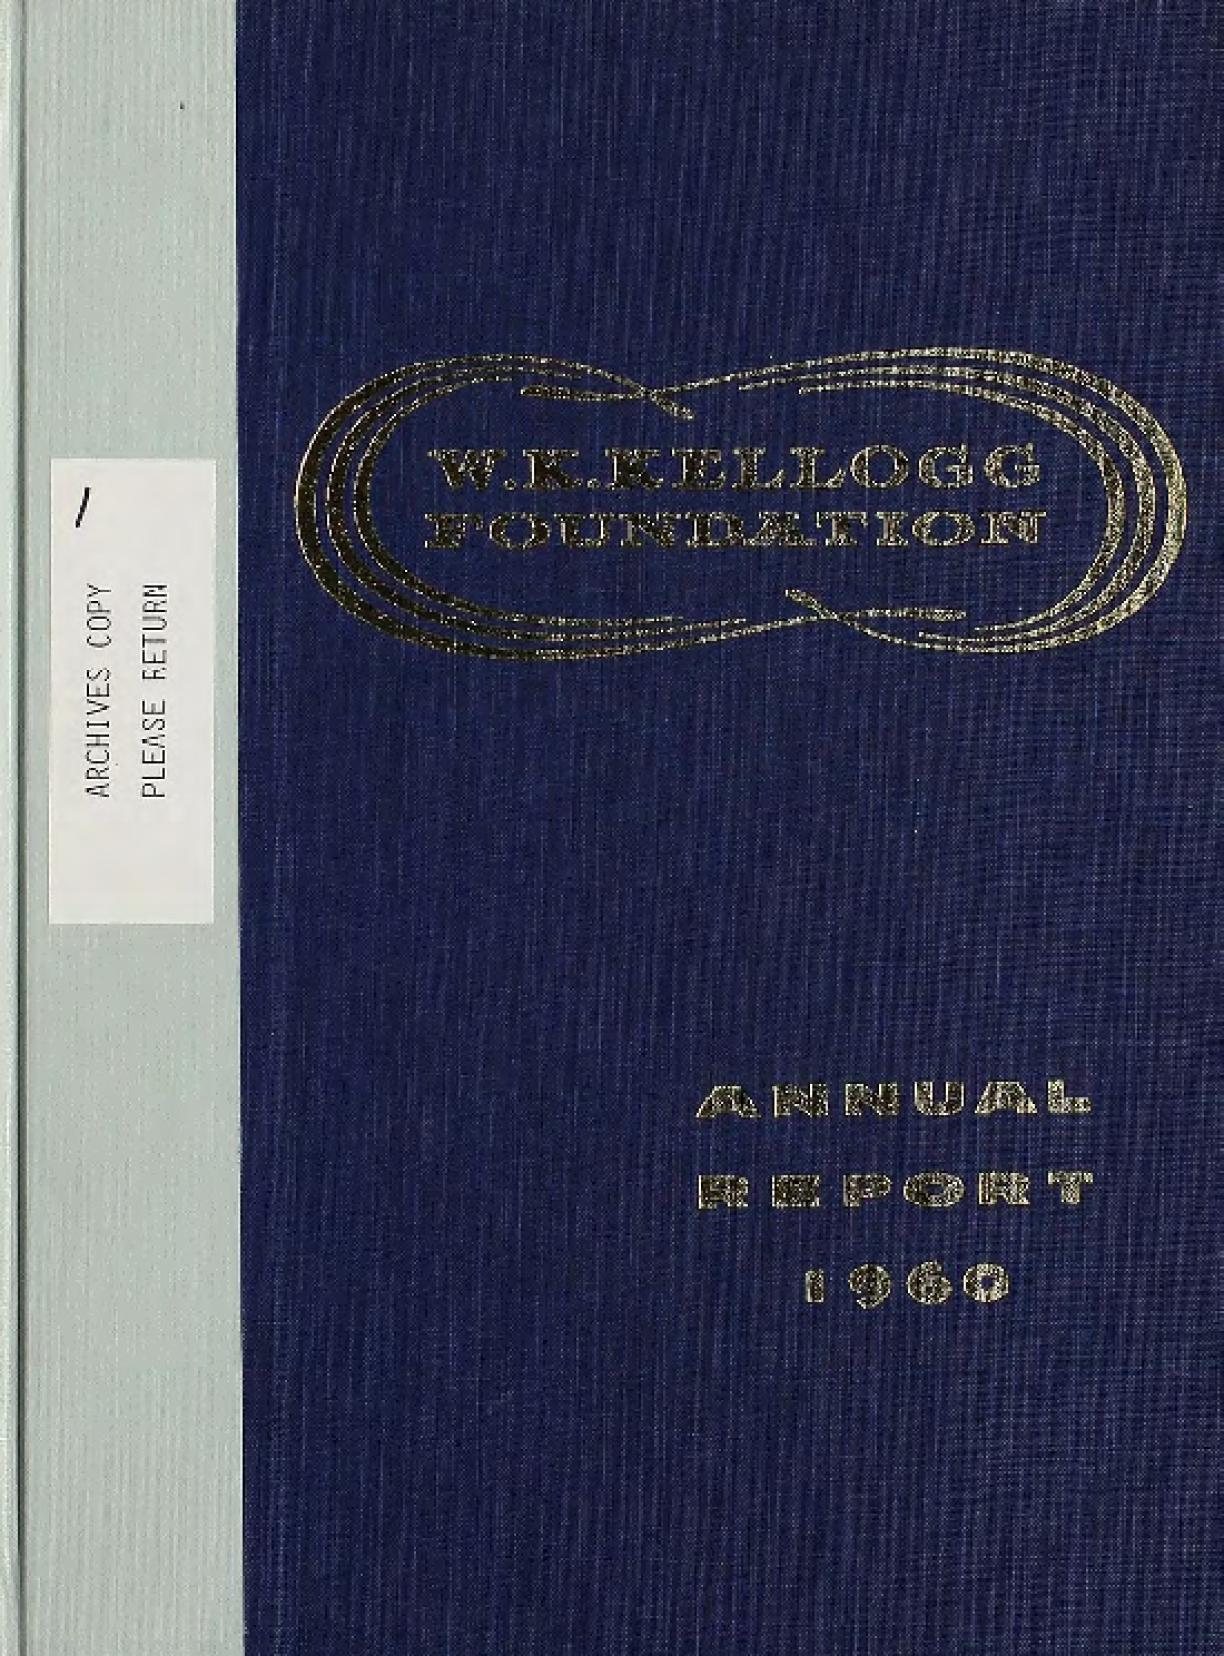 1960 W.K. Kellogg Foundation Annual Report